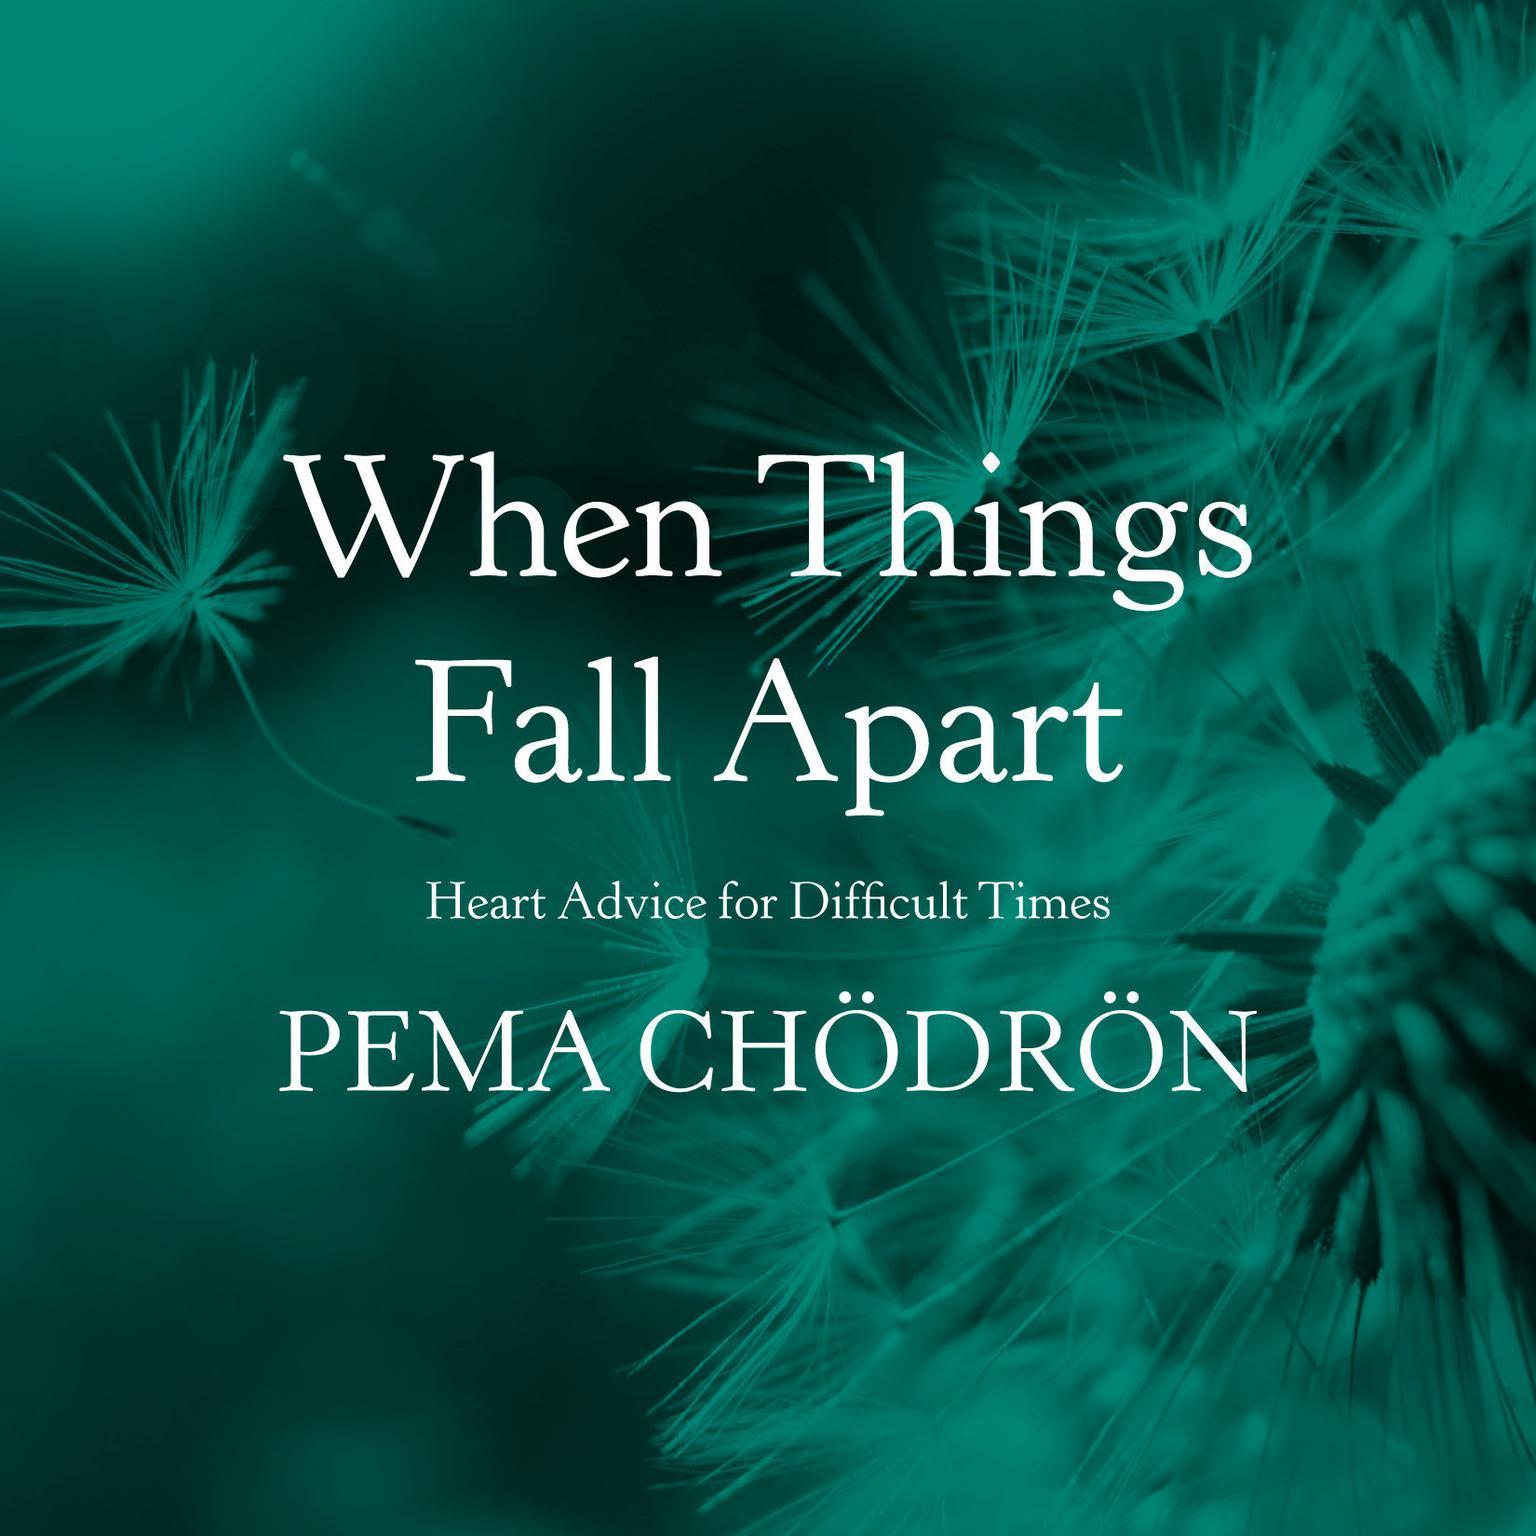 pema chodron audio collection download